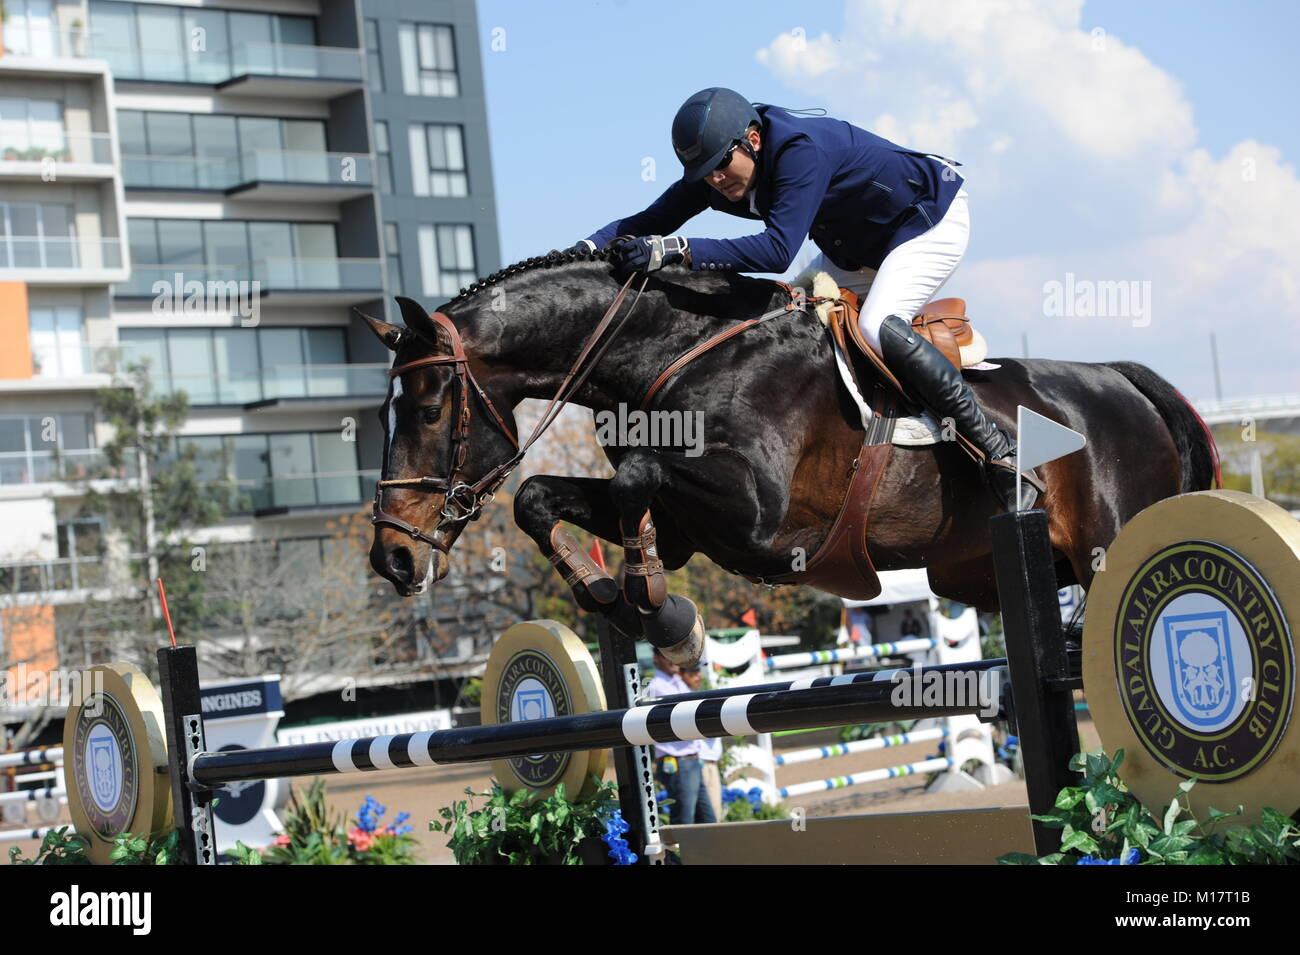 Guadalajara, Jalisco, Mexico. 27th January, 2018.CSI 4*, Longines World Cup, Manuel Senderos (MEX)  riding Lawitano. Stock Photo